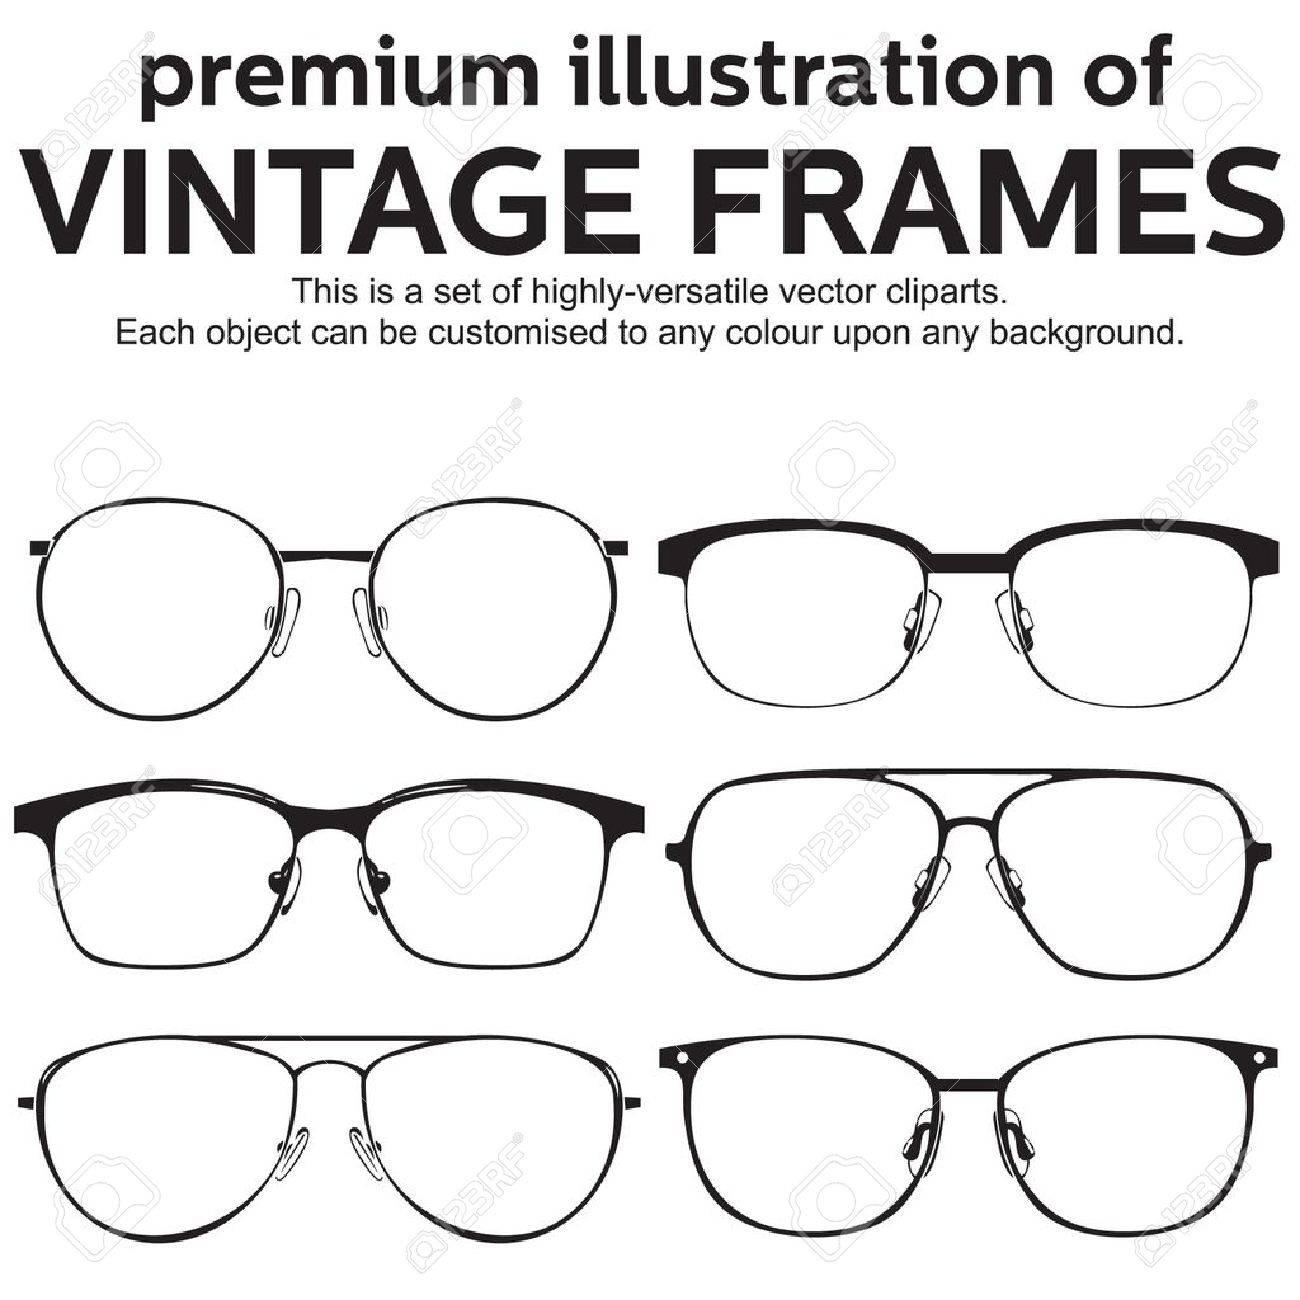 thin metal framed geek glasses vintage style Stock Vector - 19826020